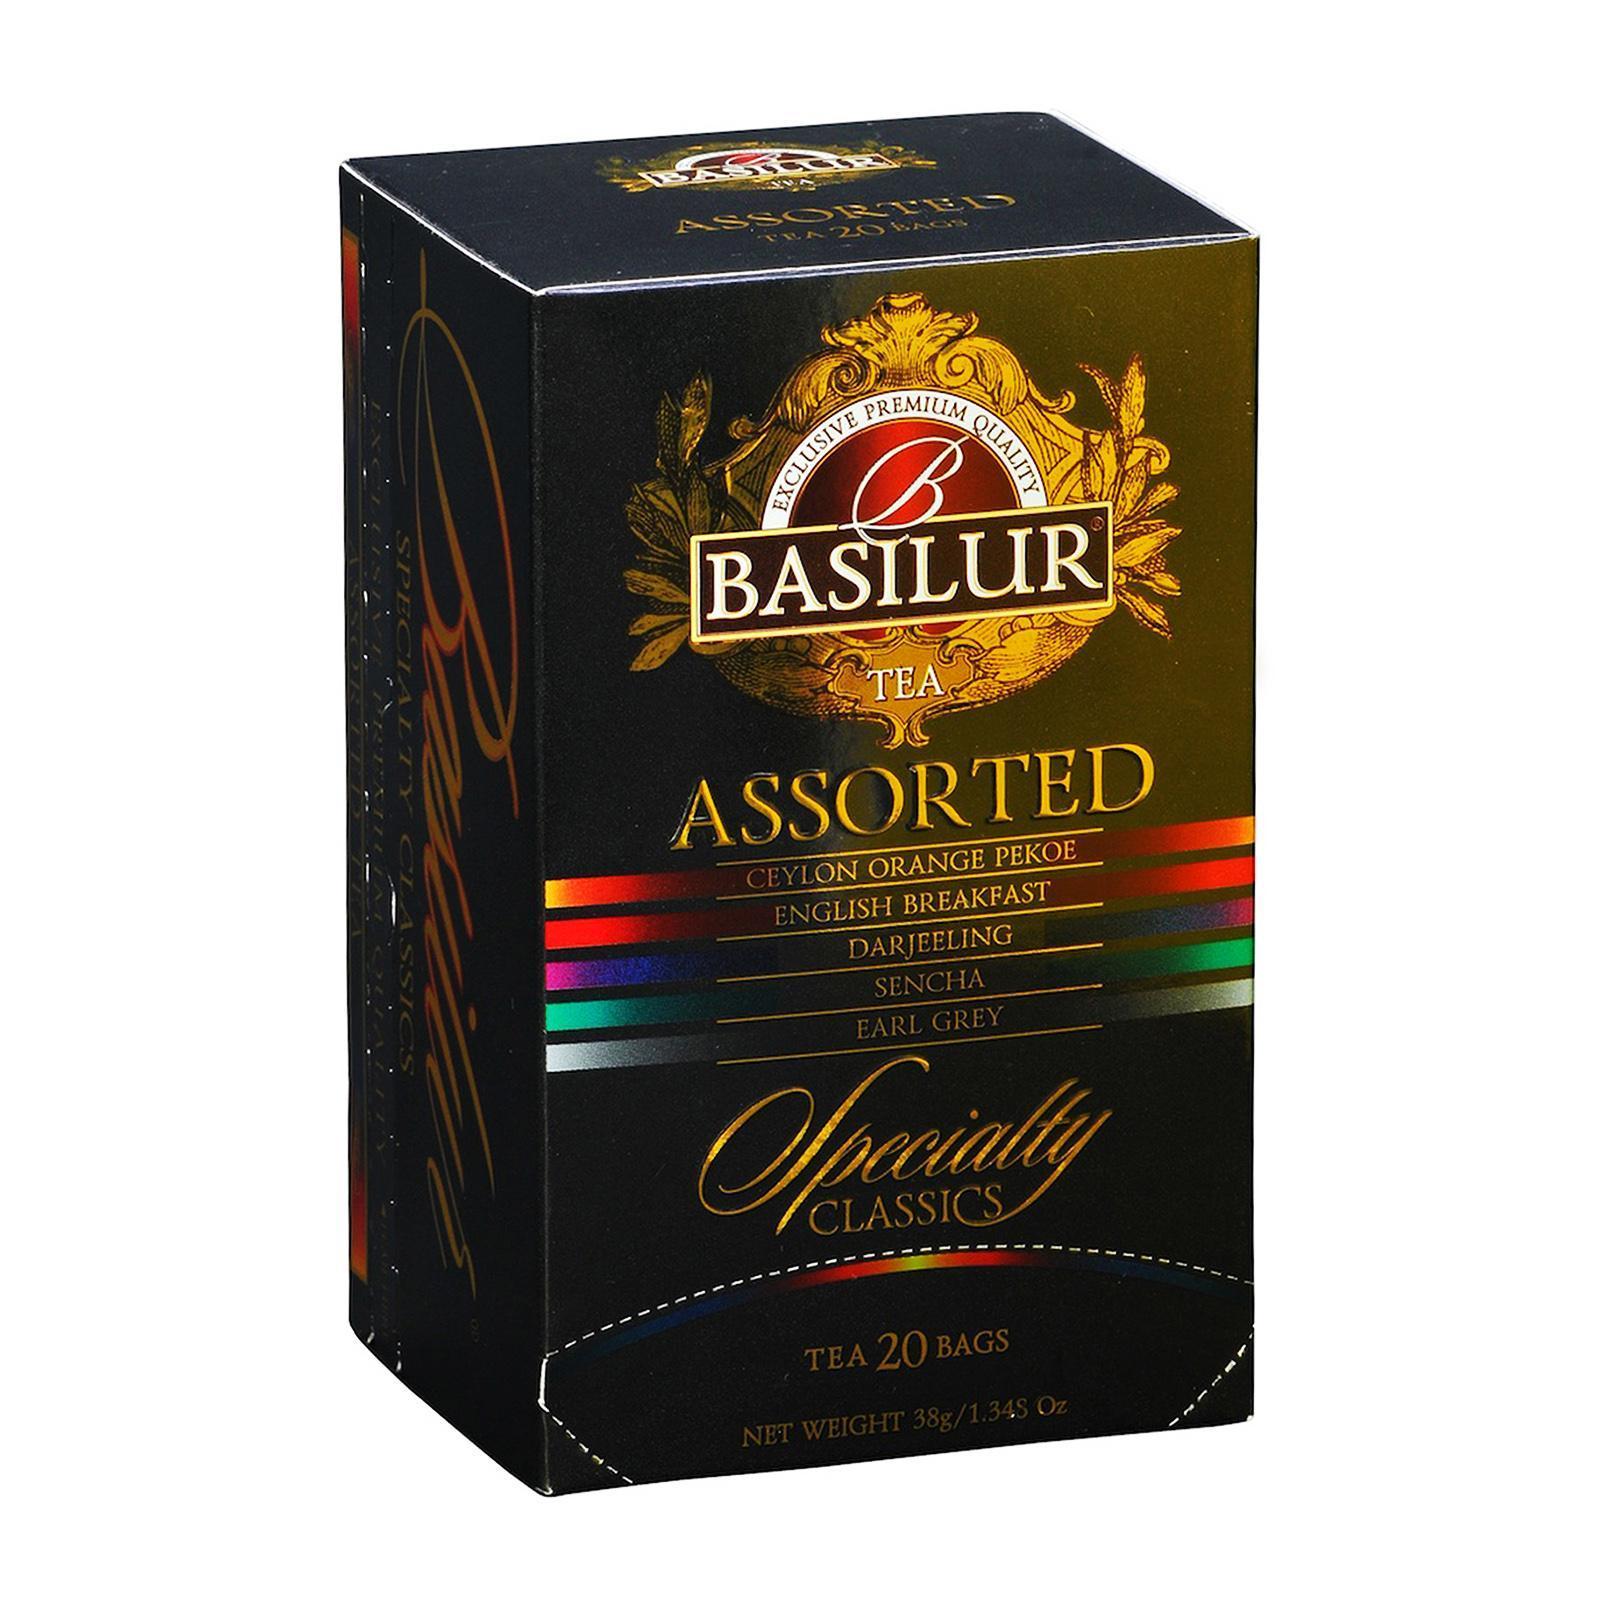 Basilur Tea Specialty Classics Assorted Tea